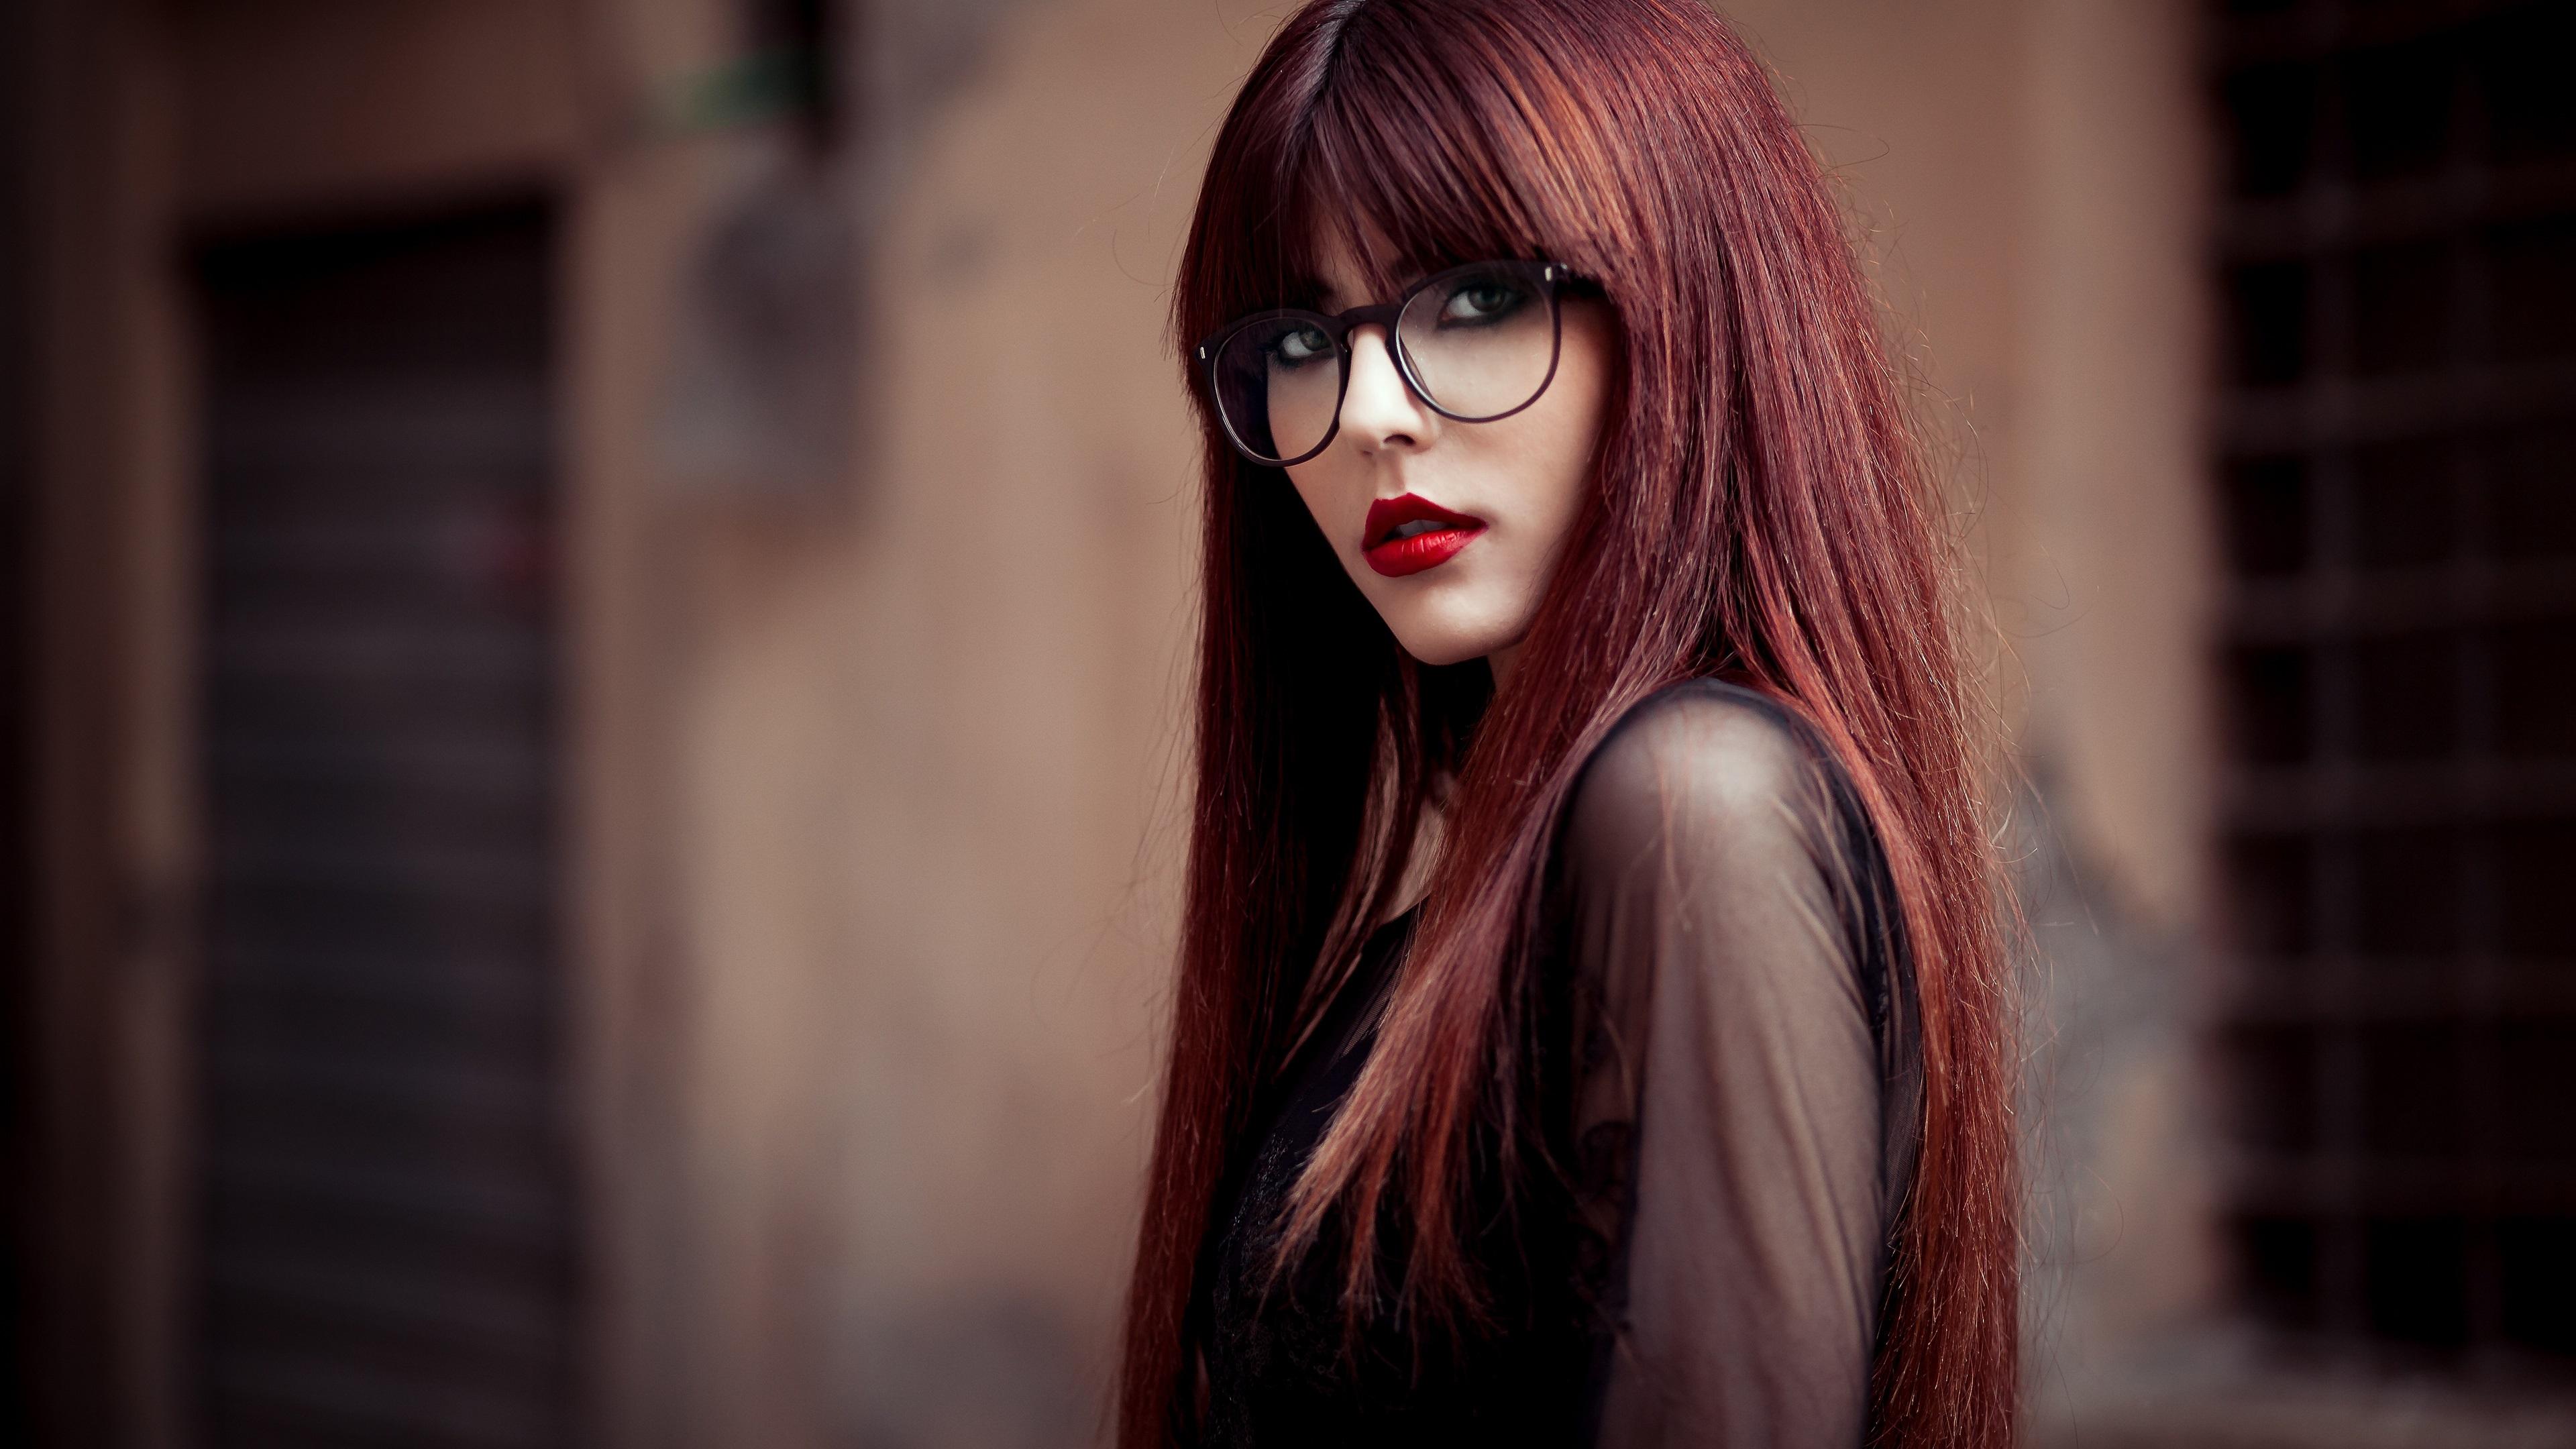 девушка очки волосы бесплатно